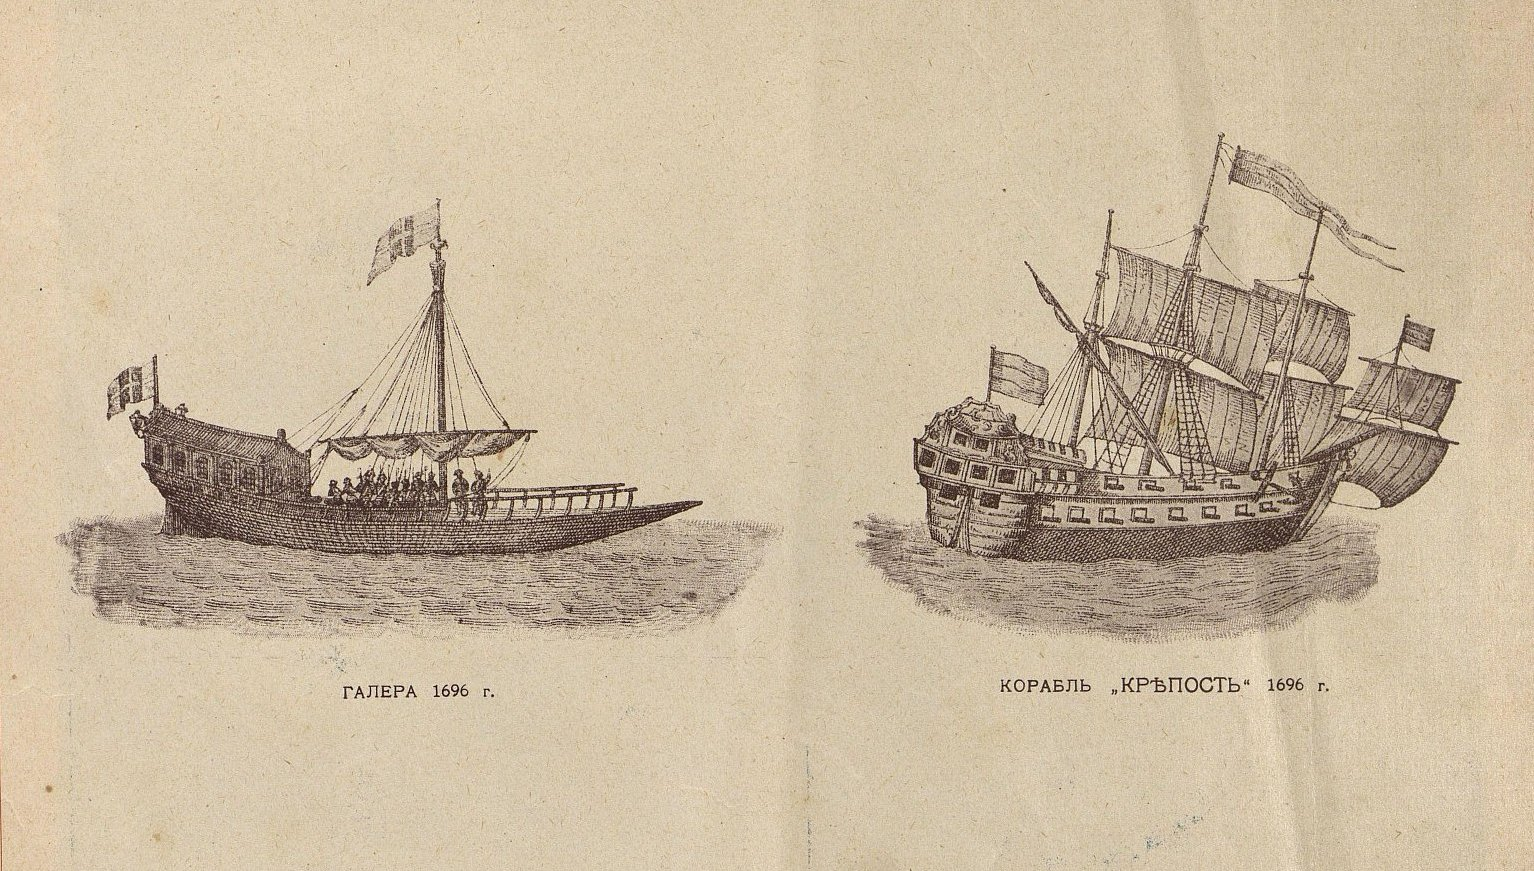 Галера 1696 г., корабль «Крепость» 1696 г.